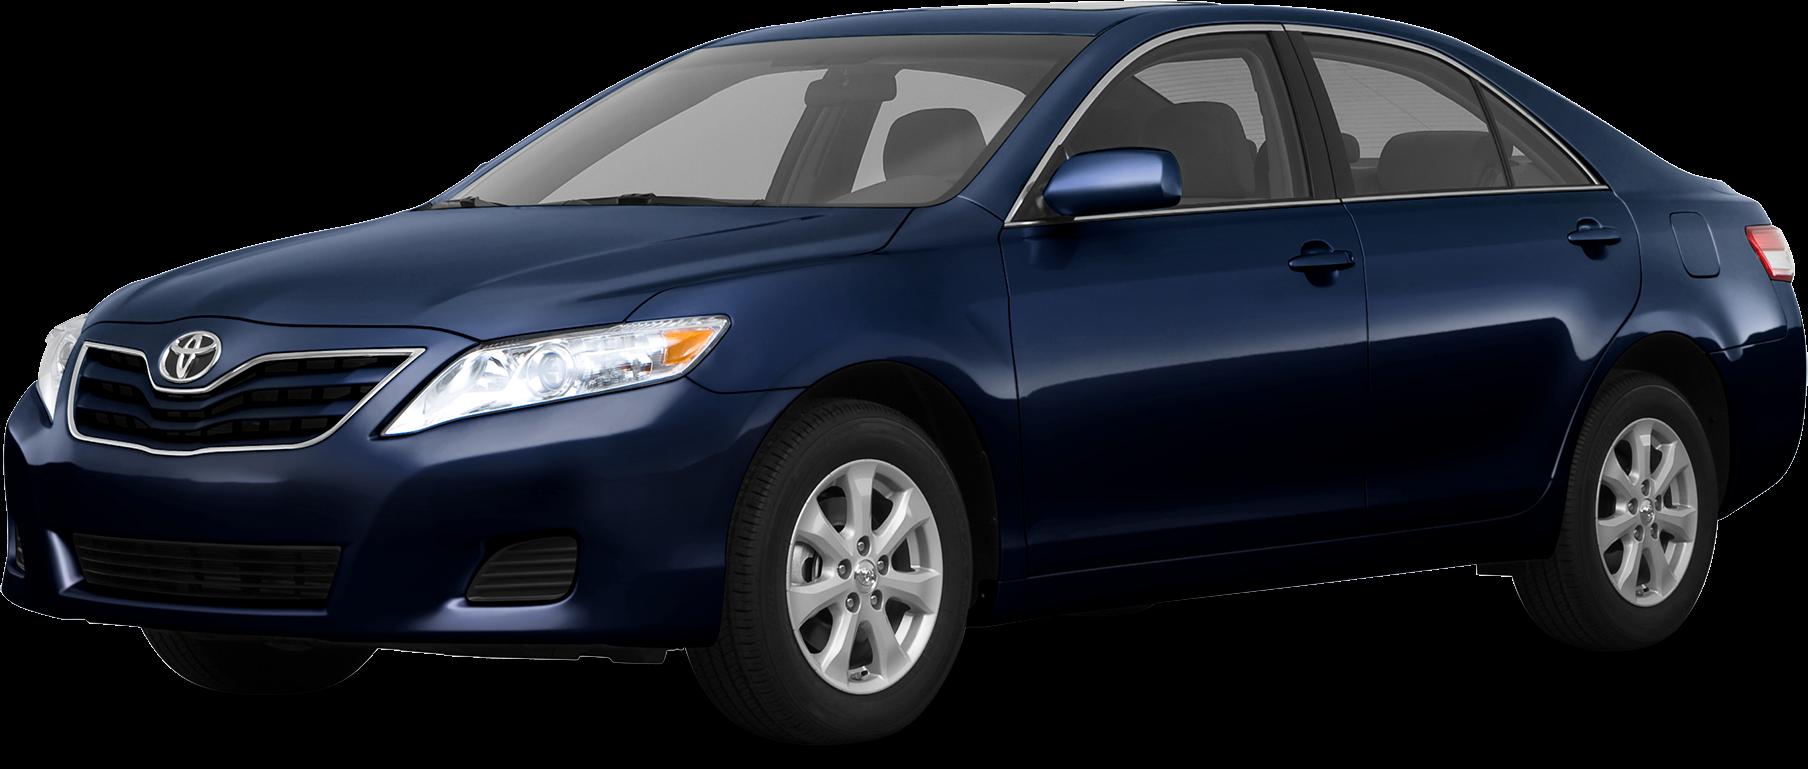 Used 2012 Mazda Mazda3 Values Cars For Sale Kelley Blue Book